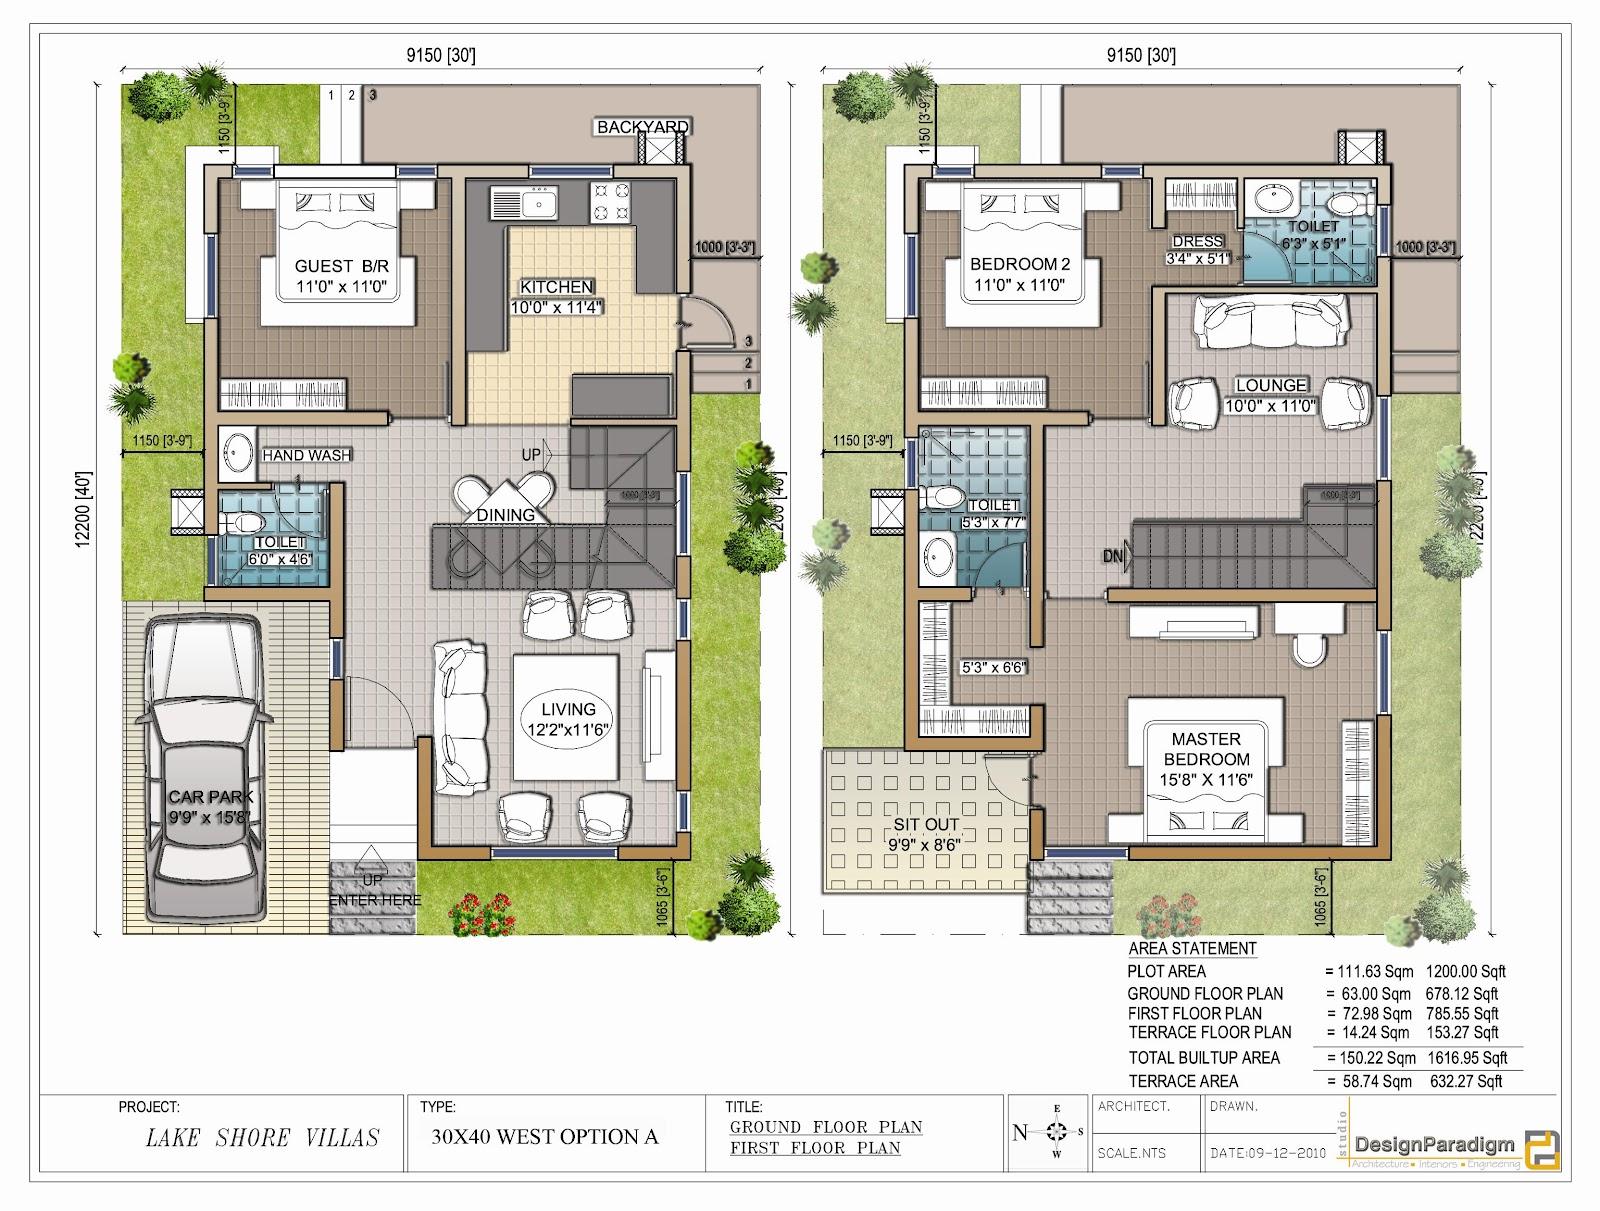 House plan per vastu nice double bedroom house plan per vastu on - Stunning As Per Vastu Shastra House Plans Ideas 3d House Designs Stunning 2 Bedroom South Facing Duplex House Floor Plans Ideas